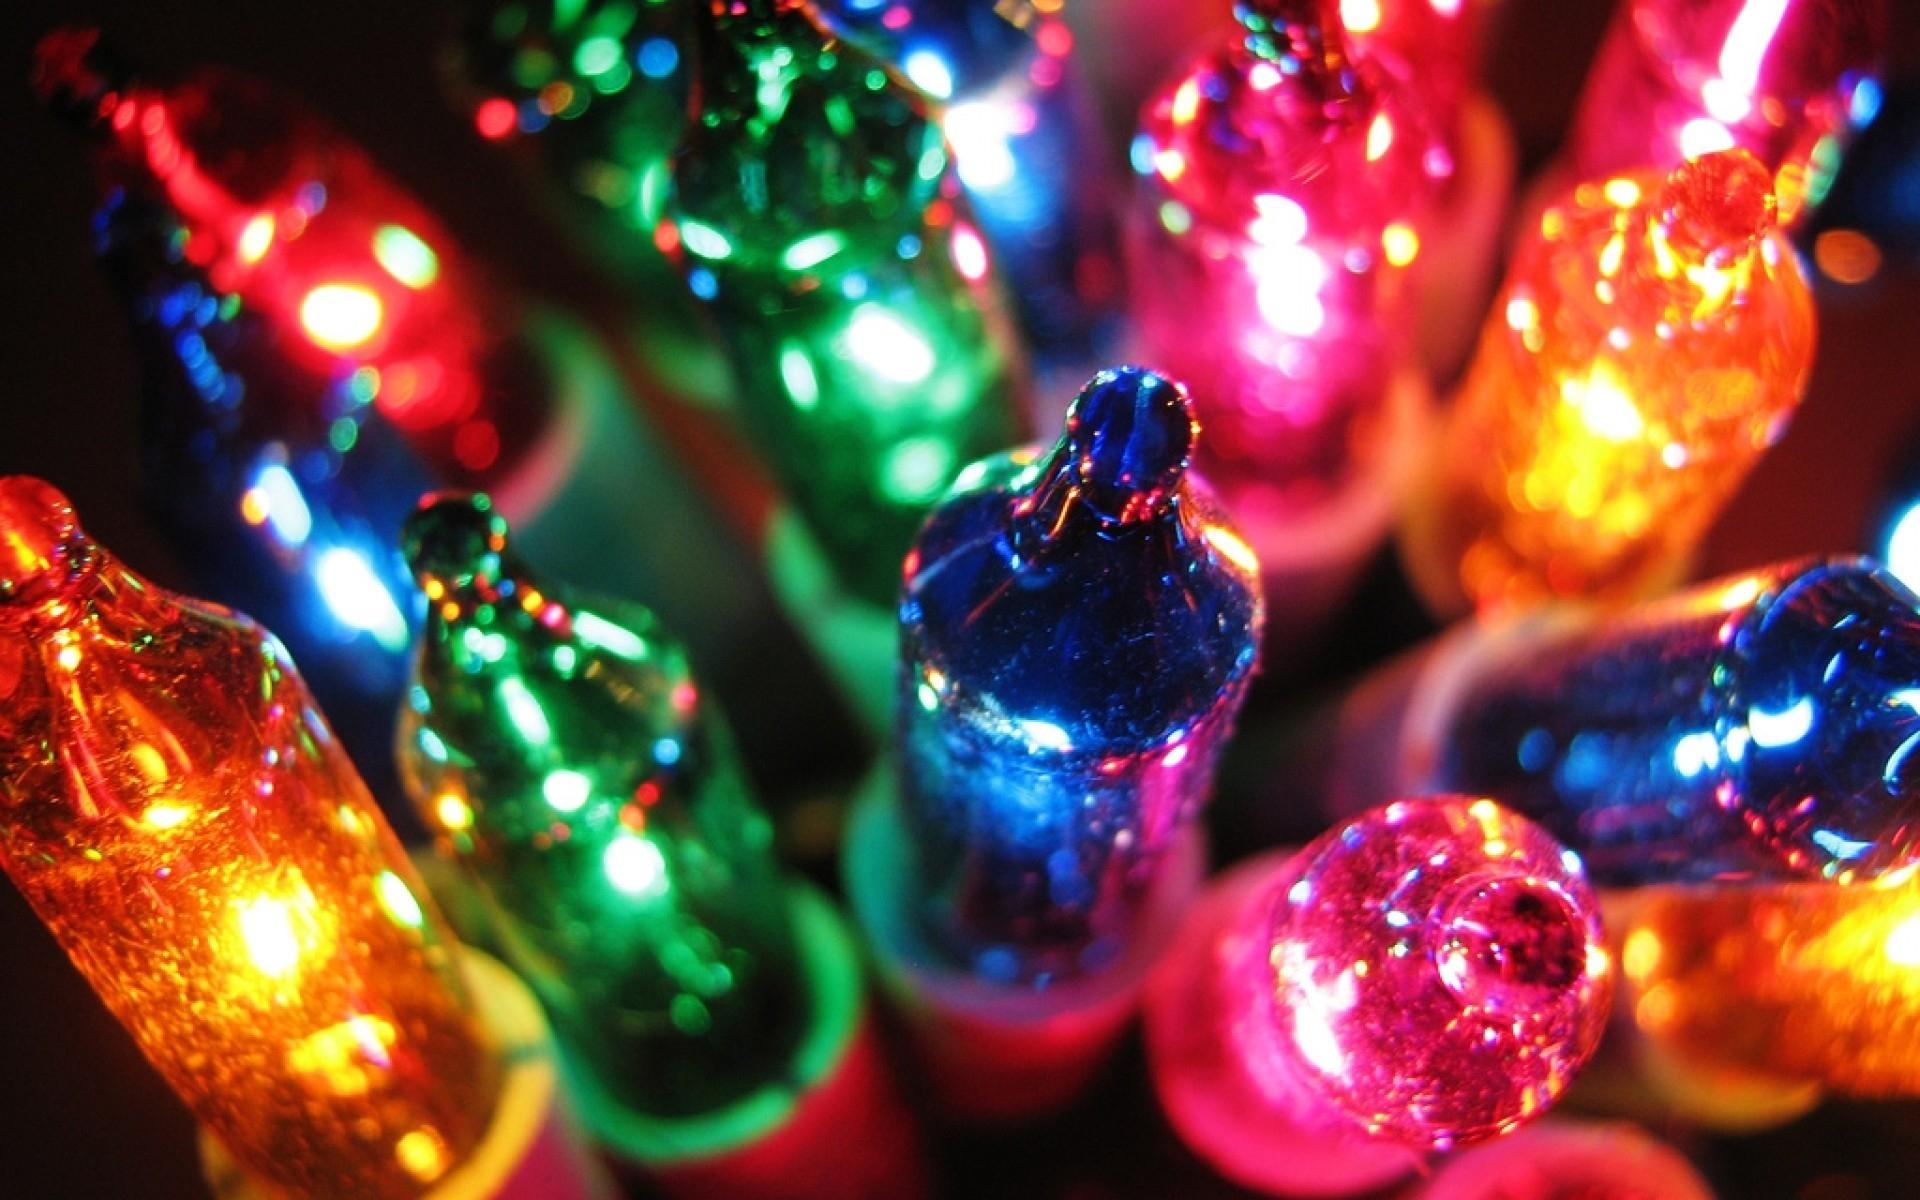 colorful christmas lights wallpaper 24366 1920x1200 px